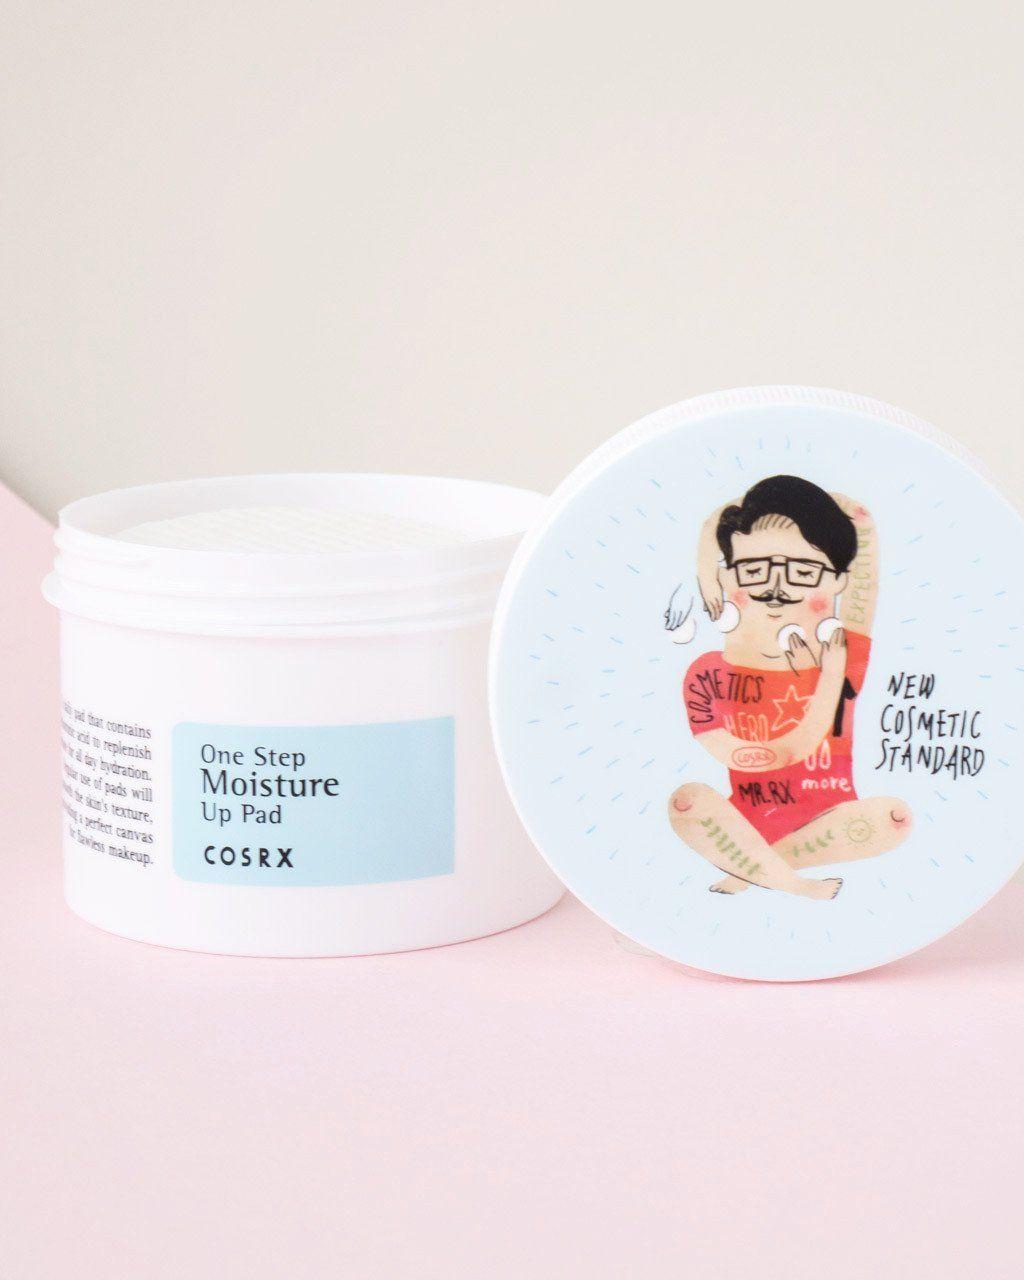 Cosrx One Step Moisture Up Pad Skin Care Tips Skin Moisturizer Skin Care Advices